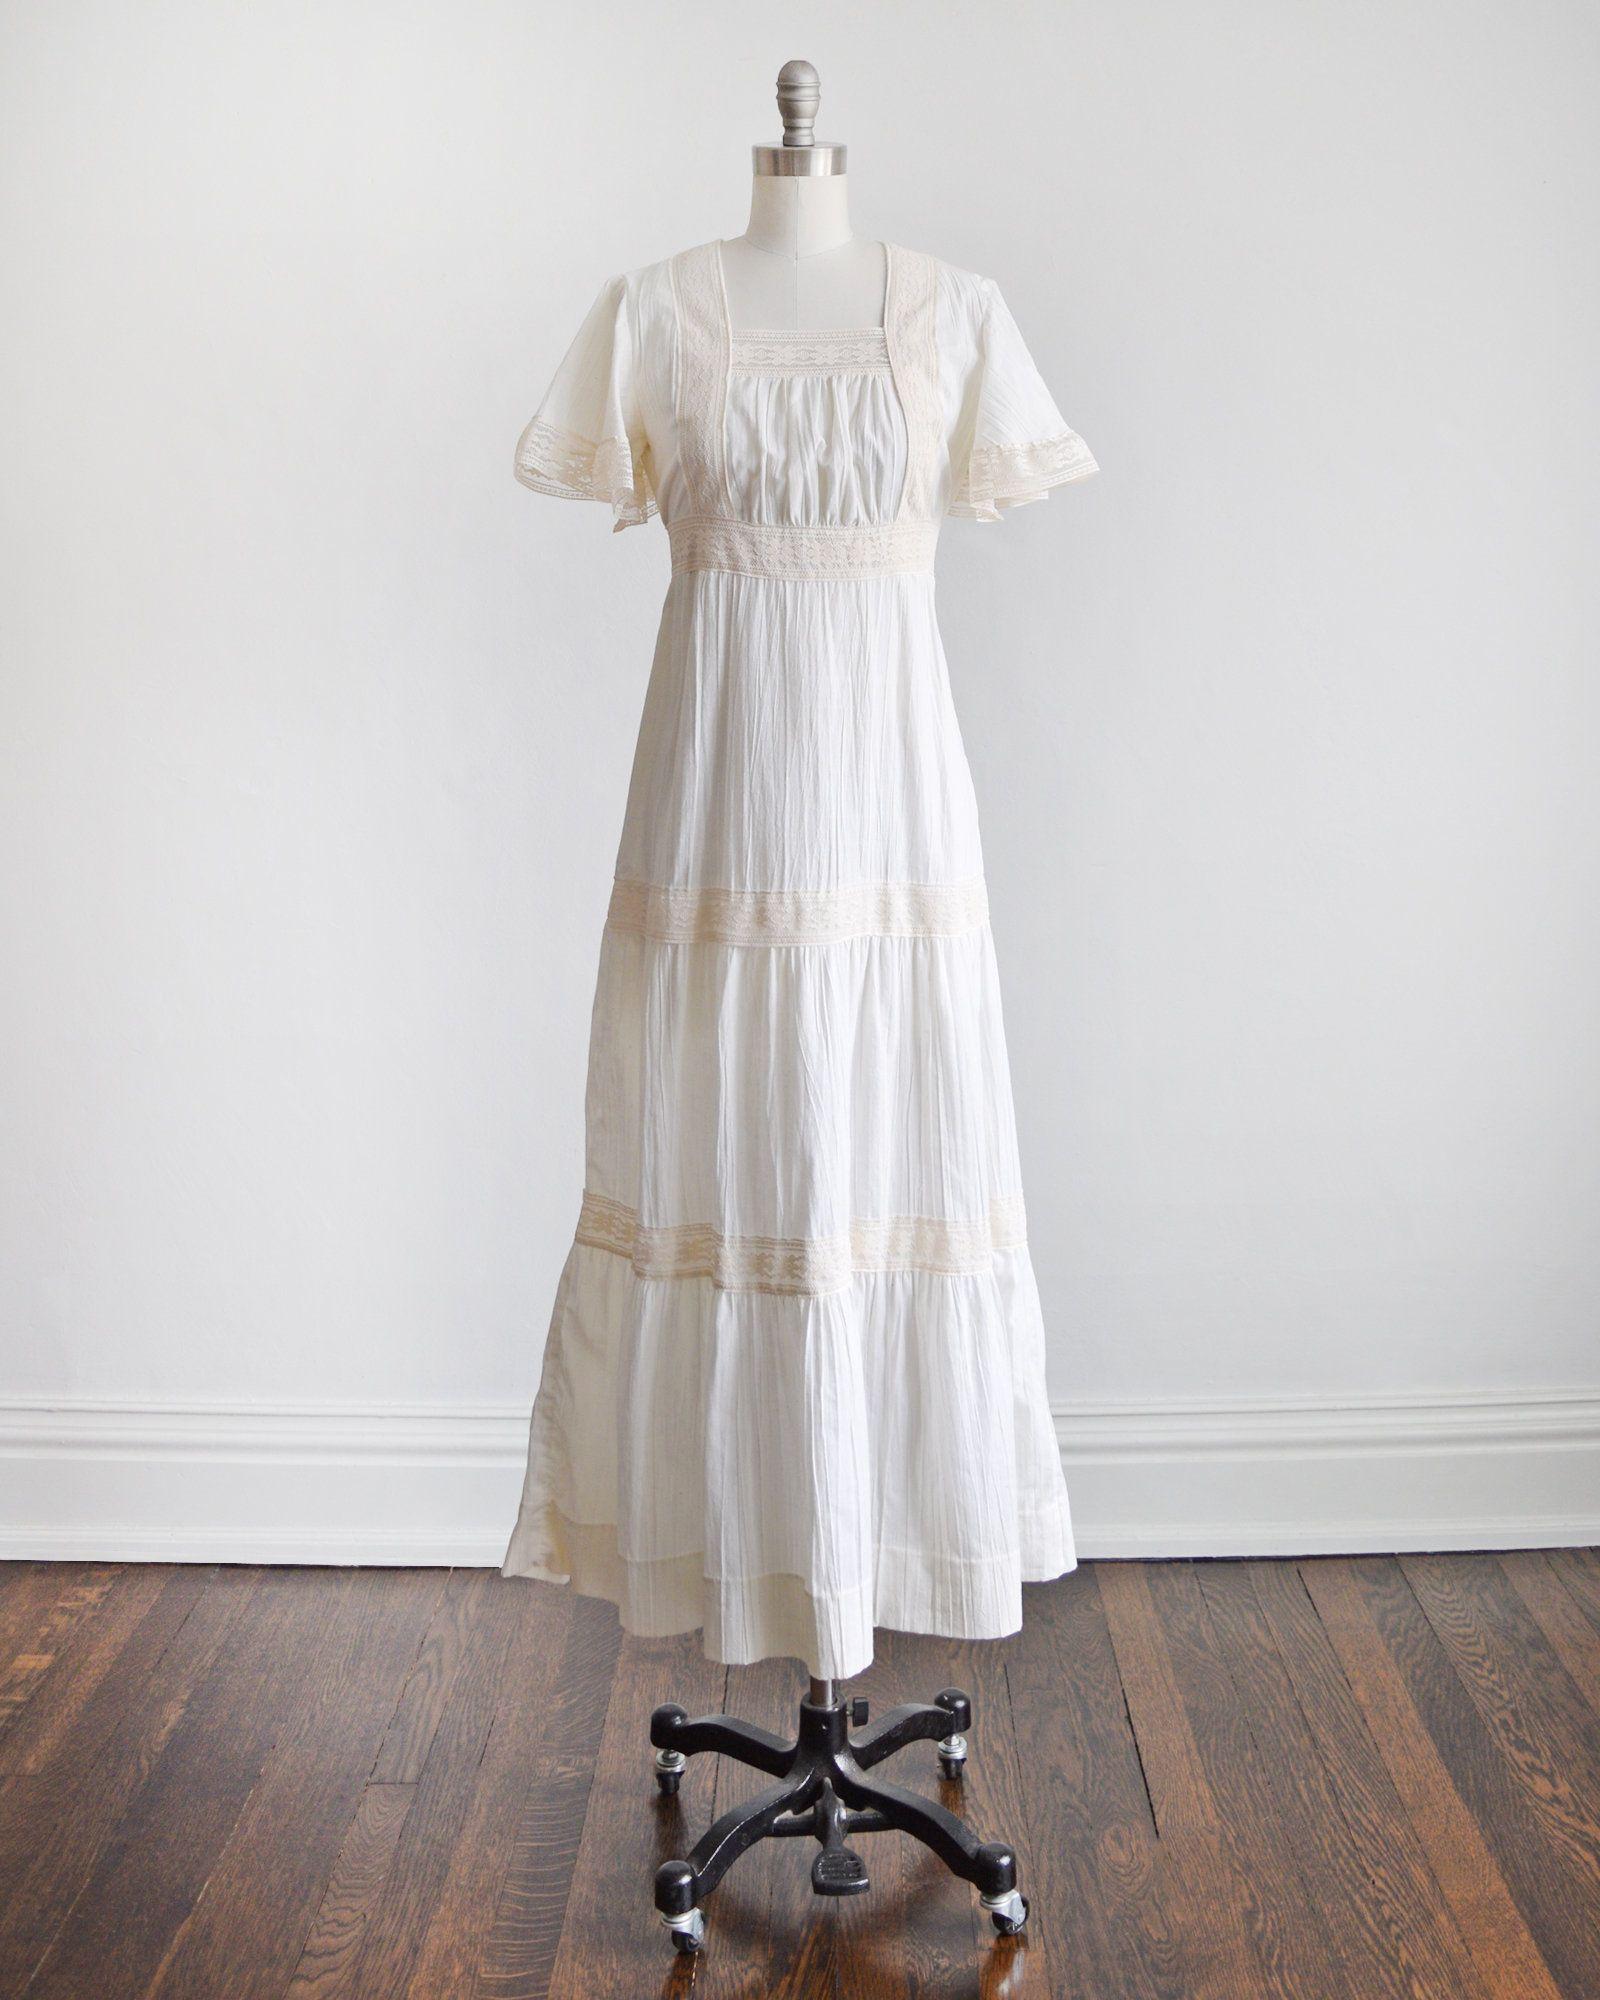 70s White Lace Maxi Dress Vintage 1970s Mexican Wedding Etsy Vintage Maxi Dress Lace Maxi Dress Lace Maxi [ 2000 x 1600 Pixel ]